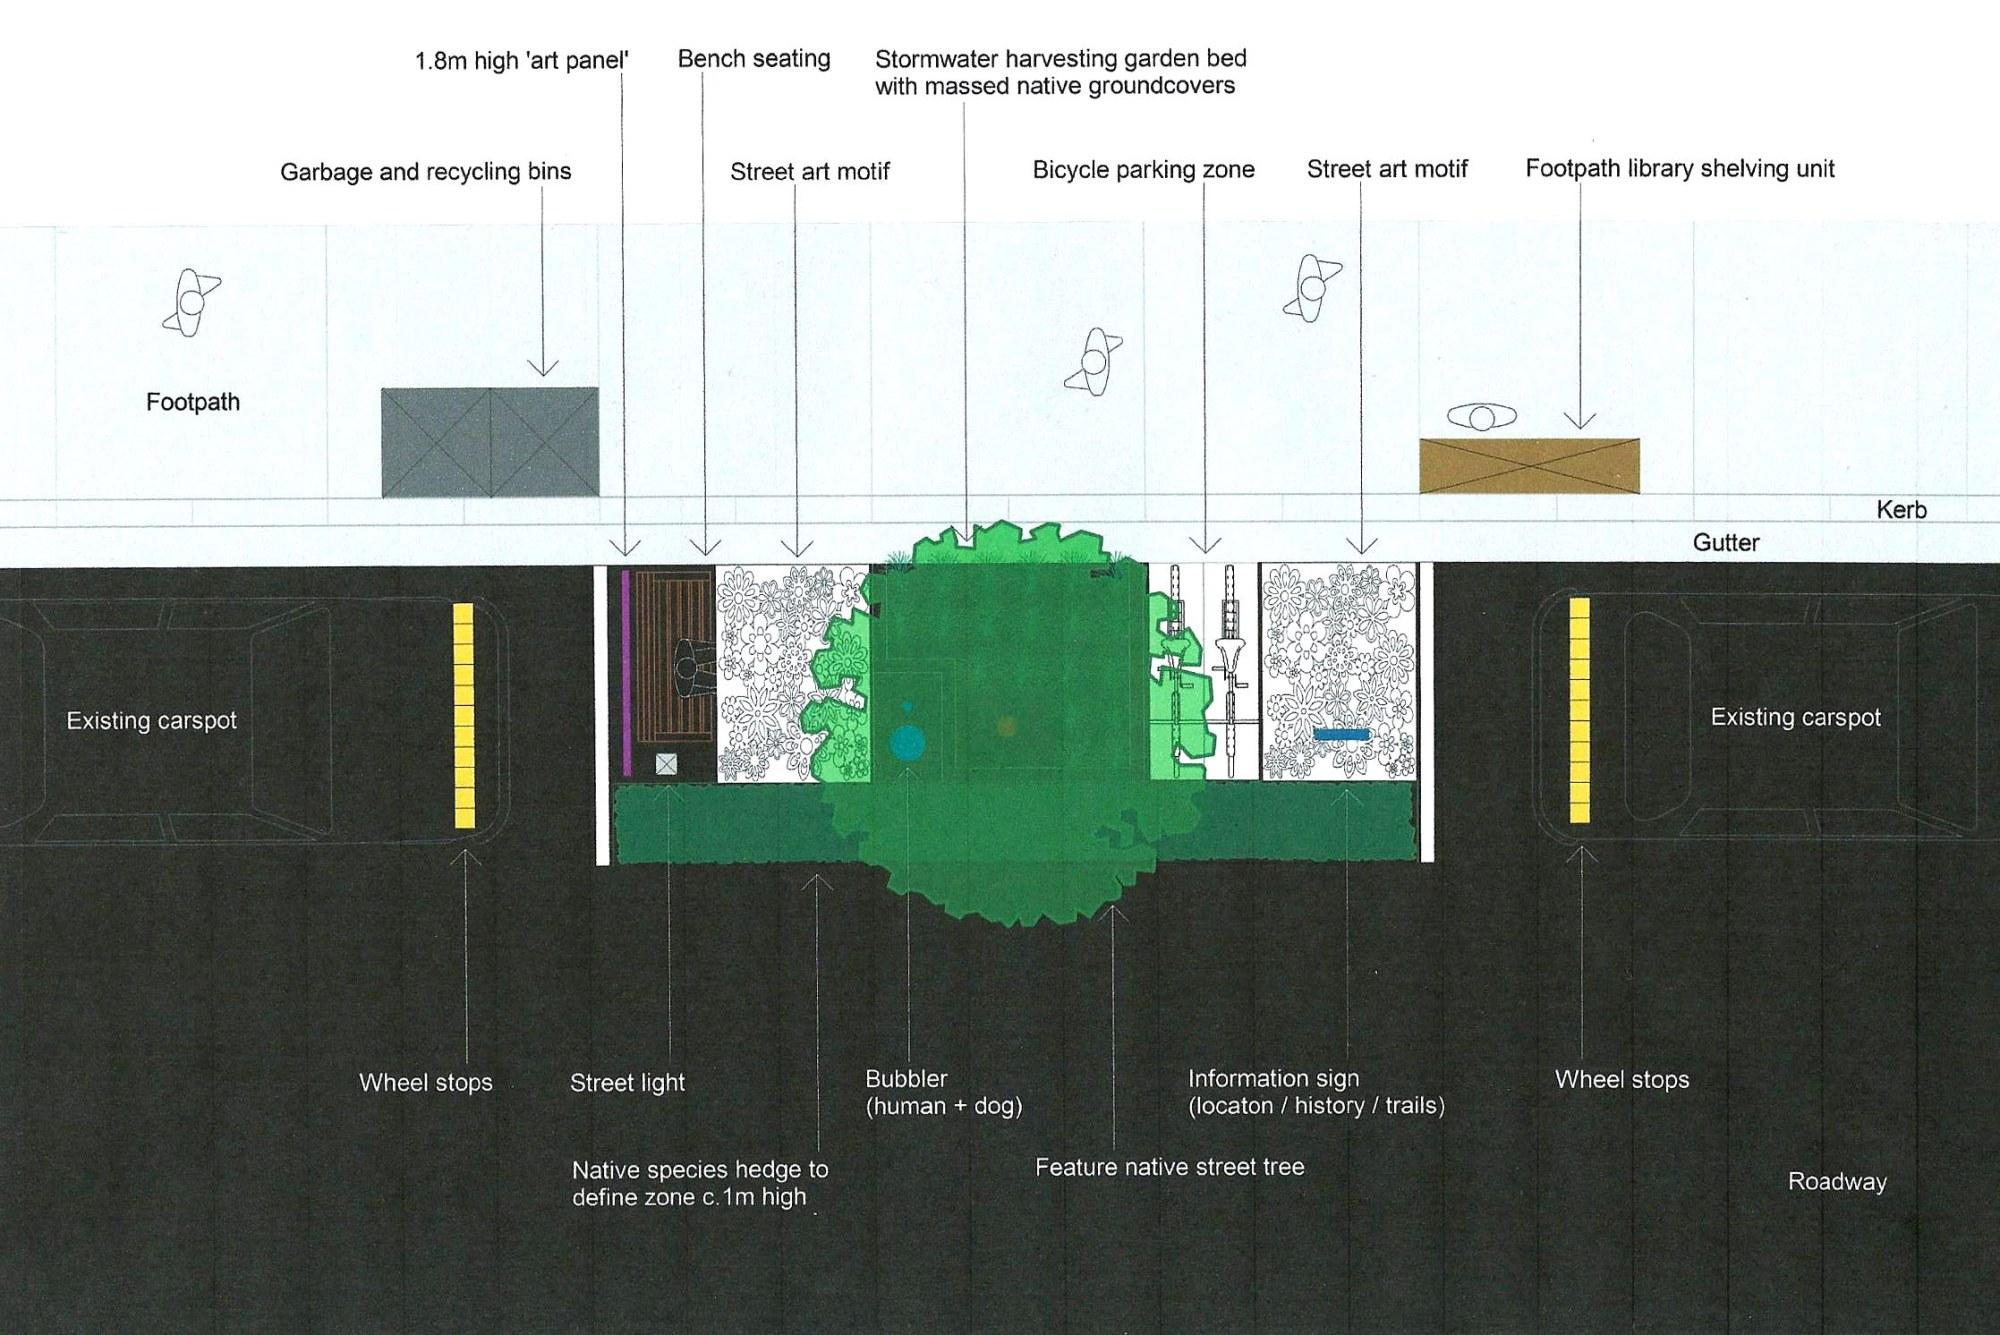 hight resolution of carspot pod plan